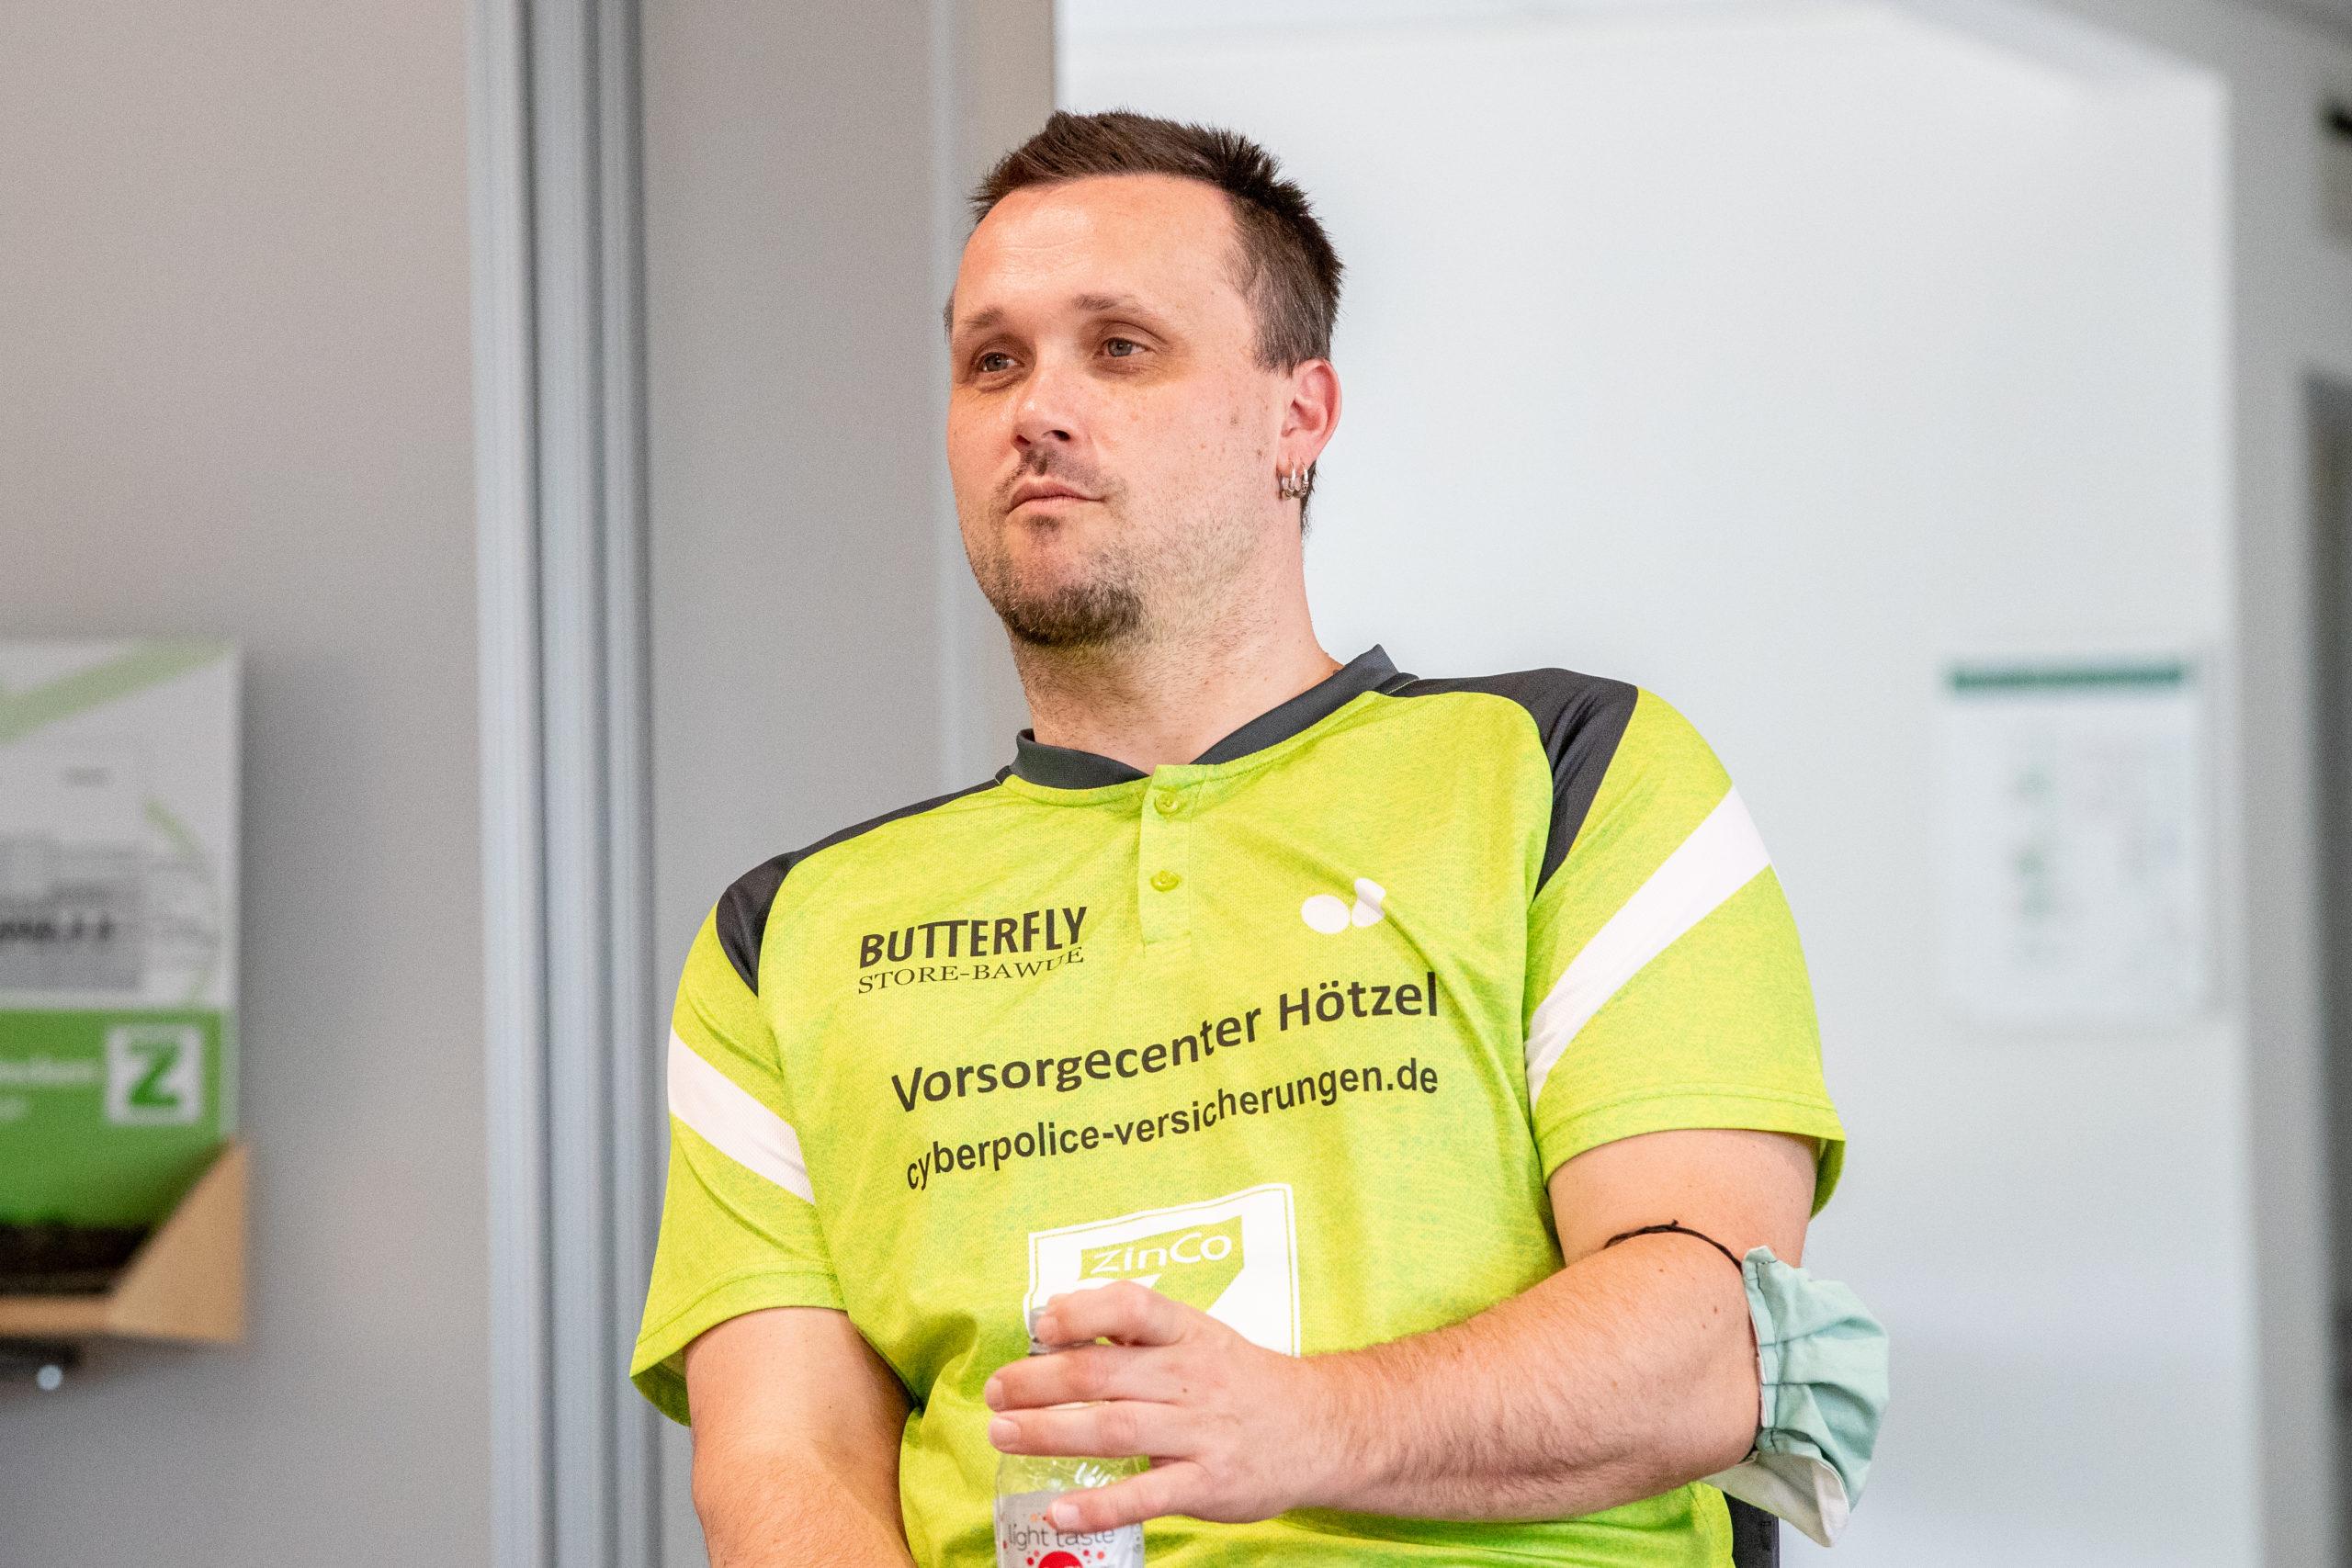 Weltmeister Thomas Brüchle auch im Landesklasse-Männerteam aktiv